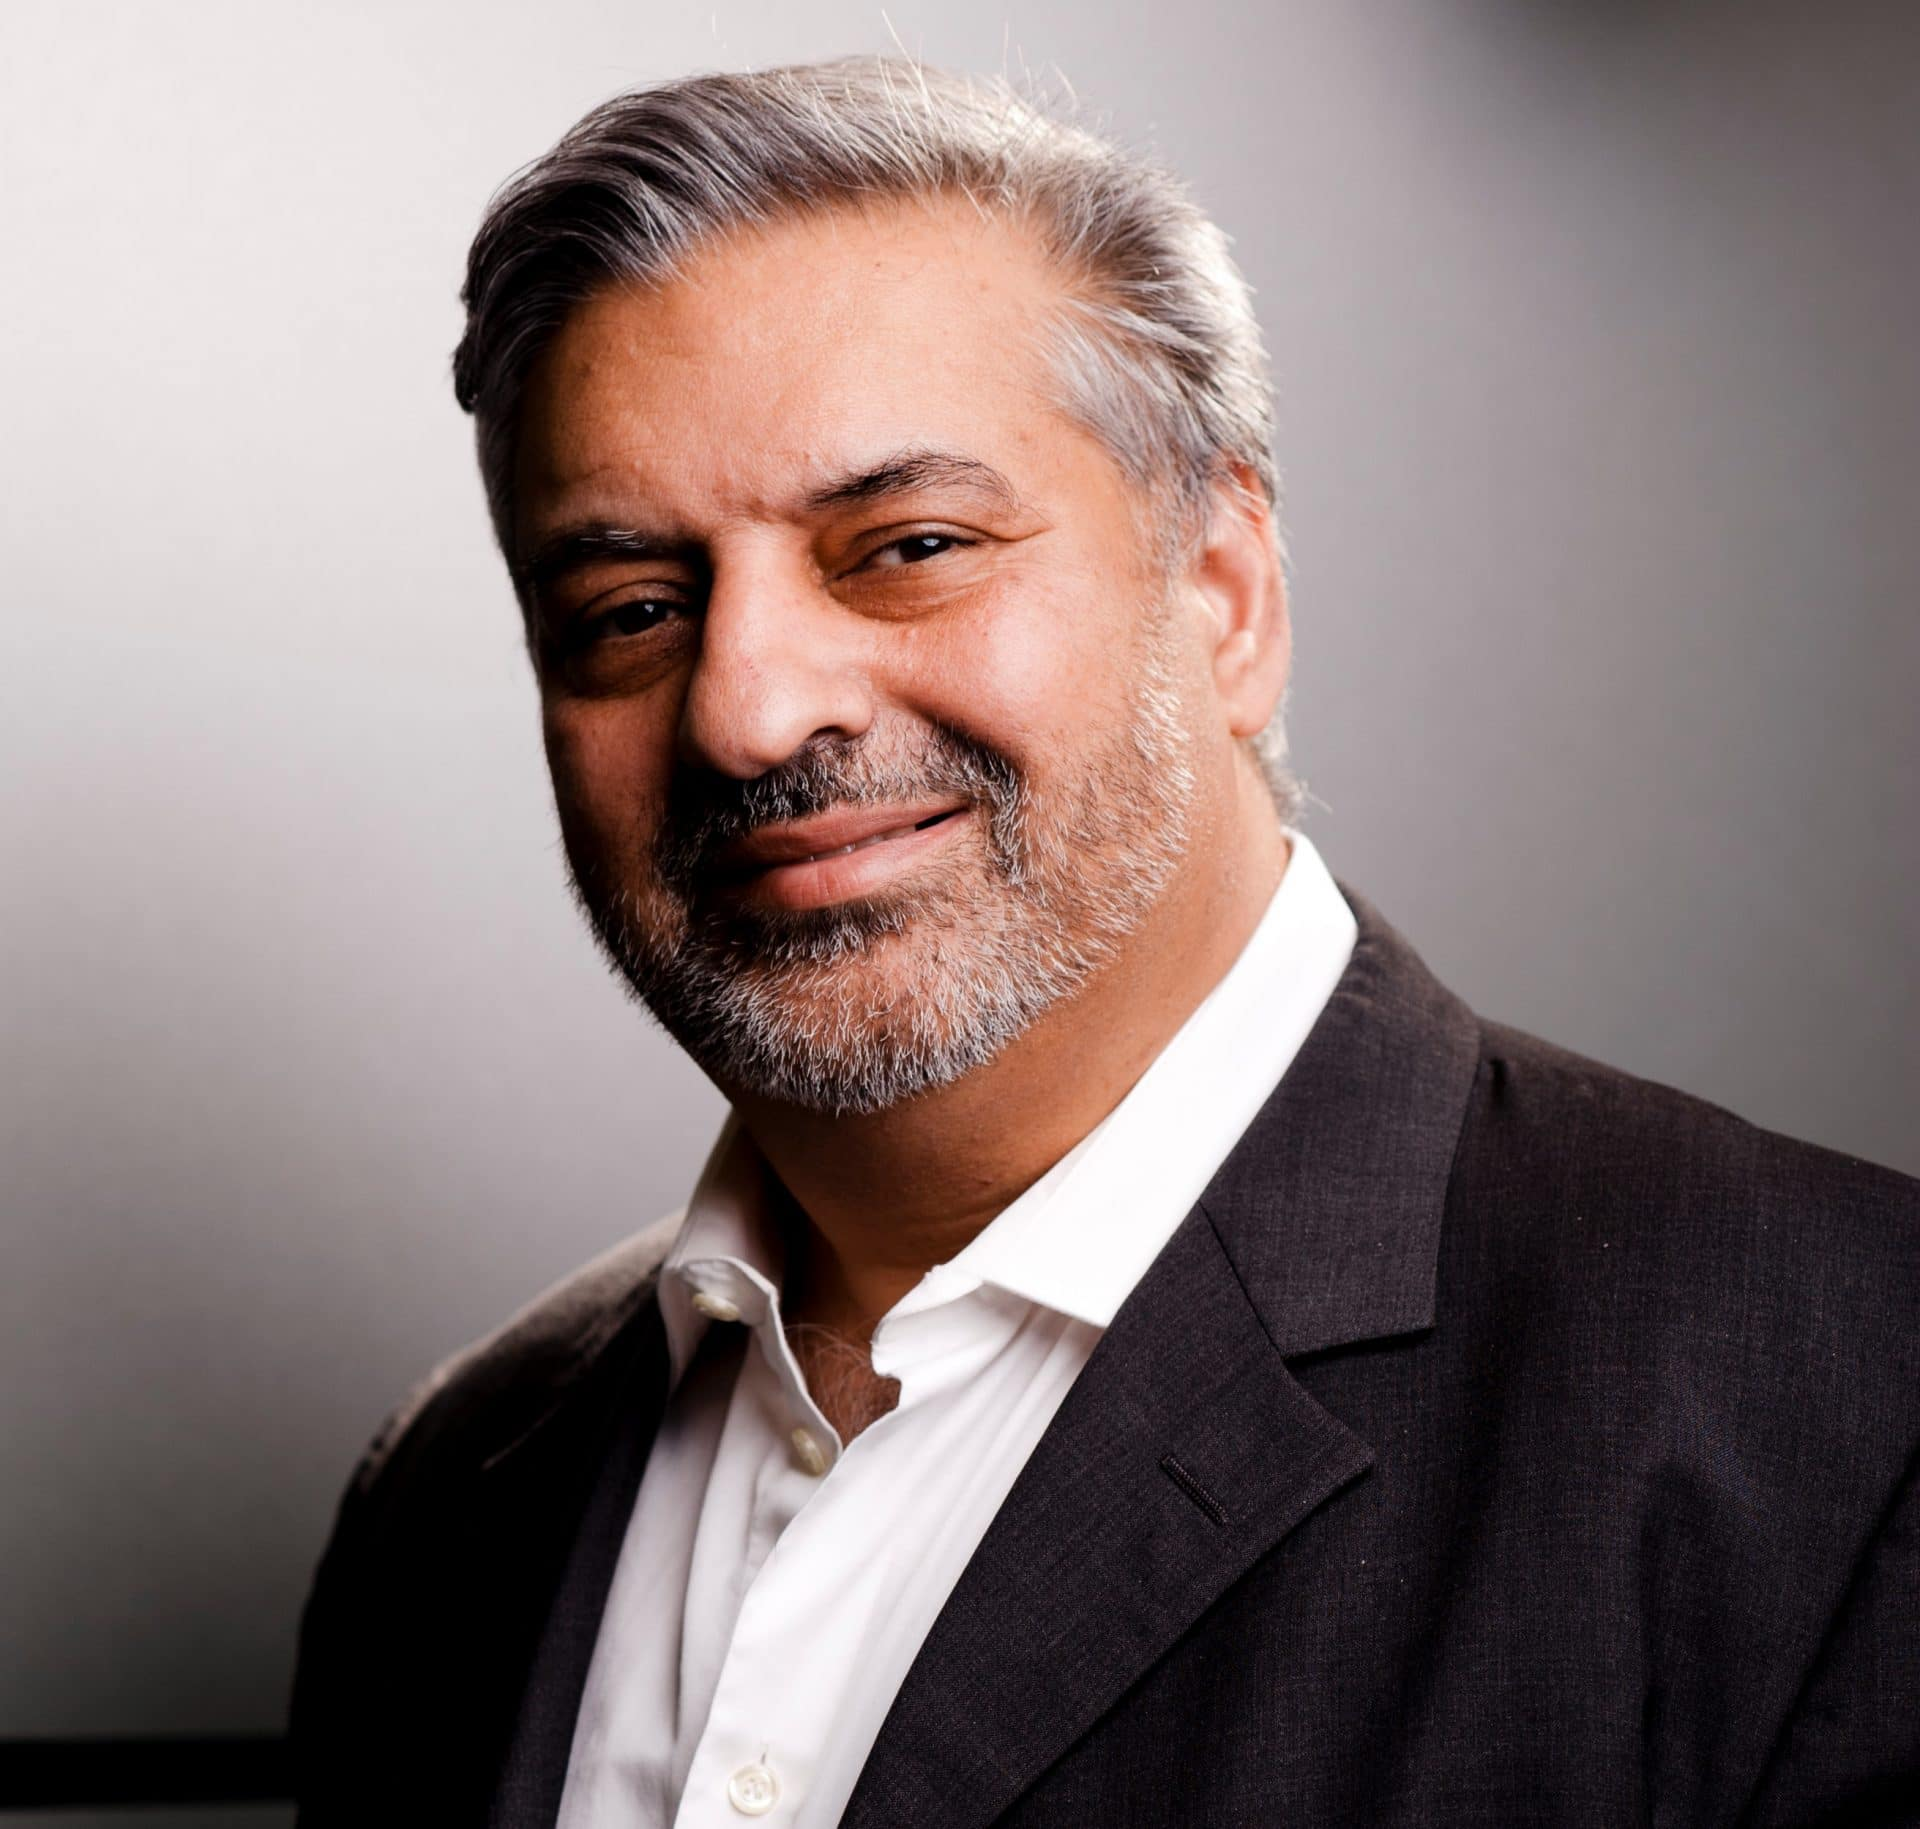 rohit-talwar-keynote-speaker